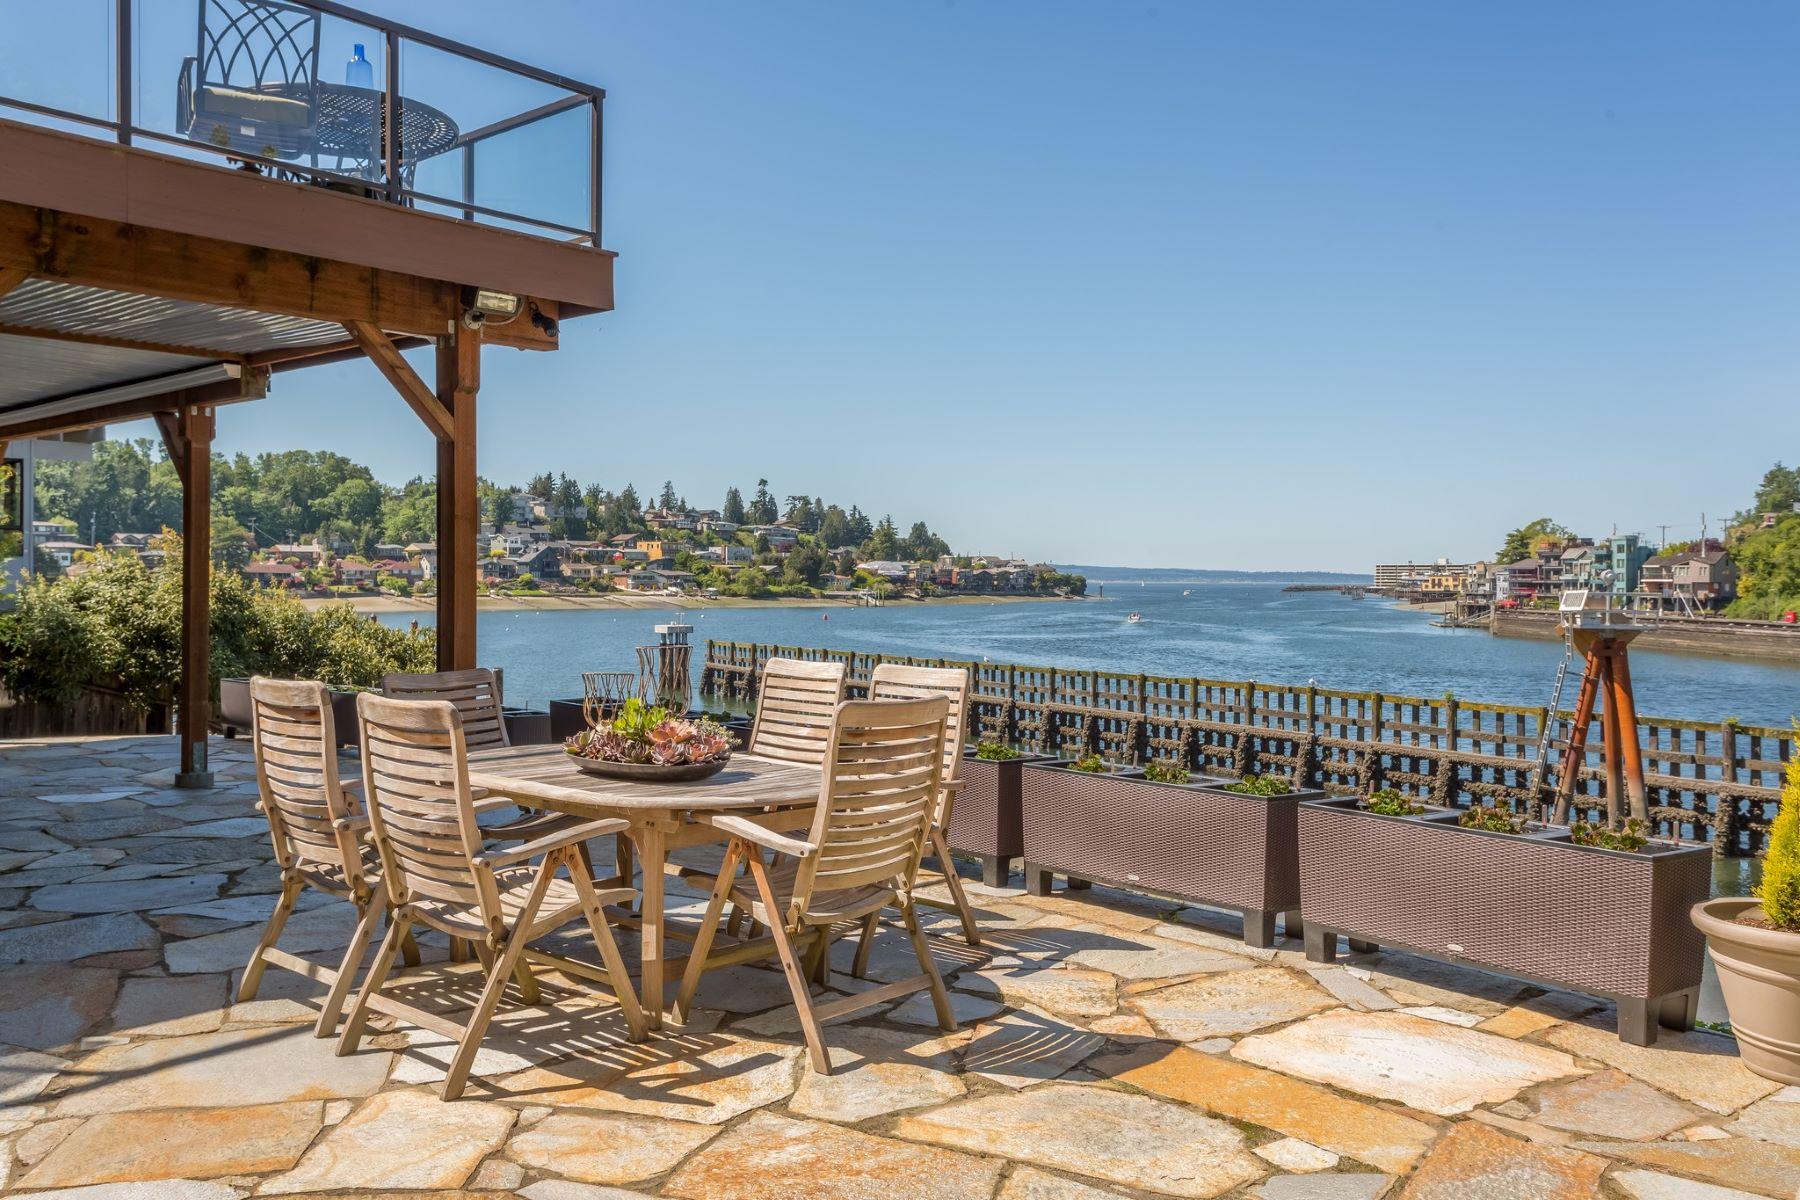 独户住宅 为 销售 在 Salmon Bay NW Contemporary 3500 W Commodore Way Magnolia, 西雅图, 华盛顿州, 98199 美国